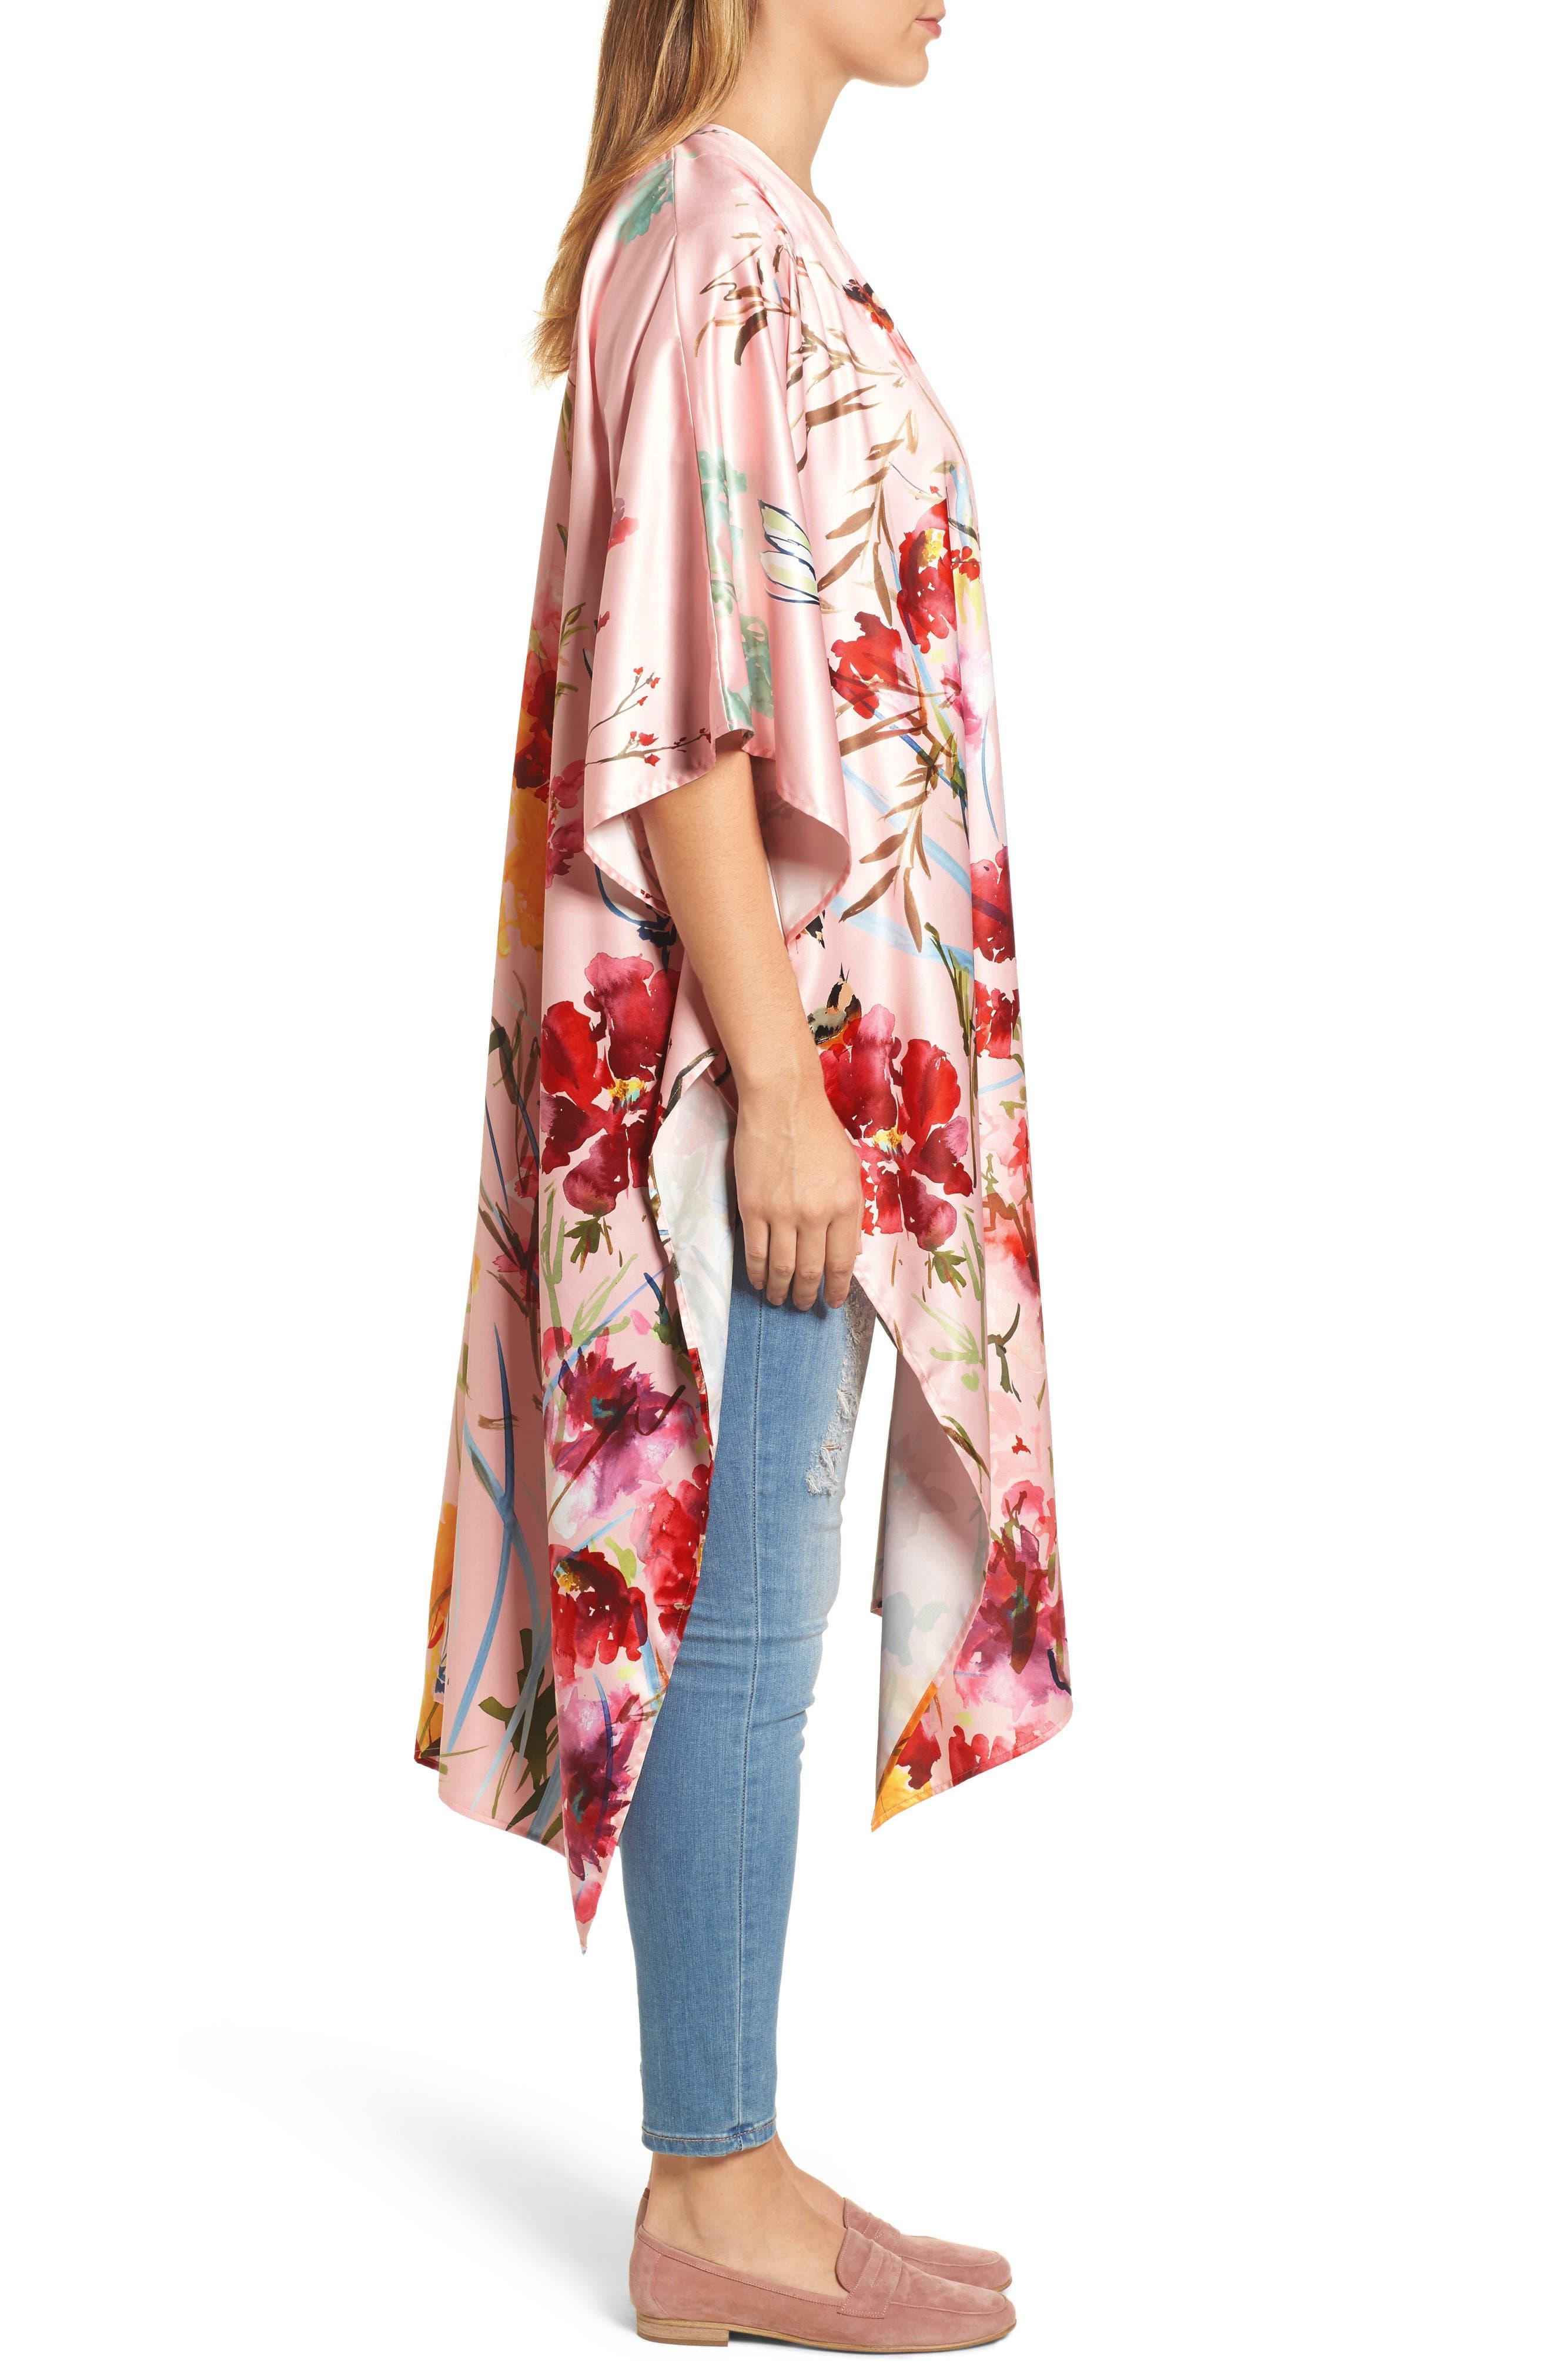 Floral Kimono,                             Alternate thumbnail 3, color,                             Pink Fantasy Garden Print